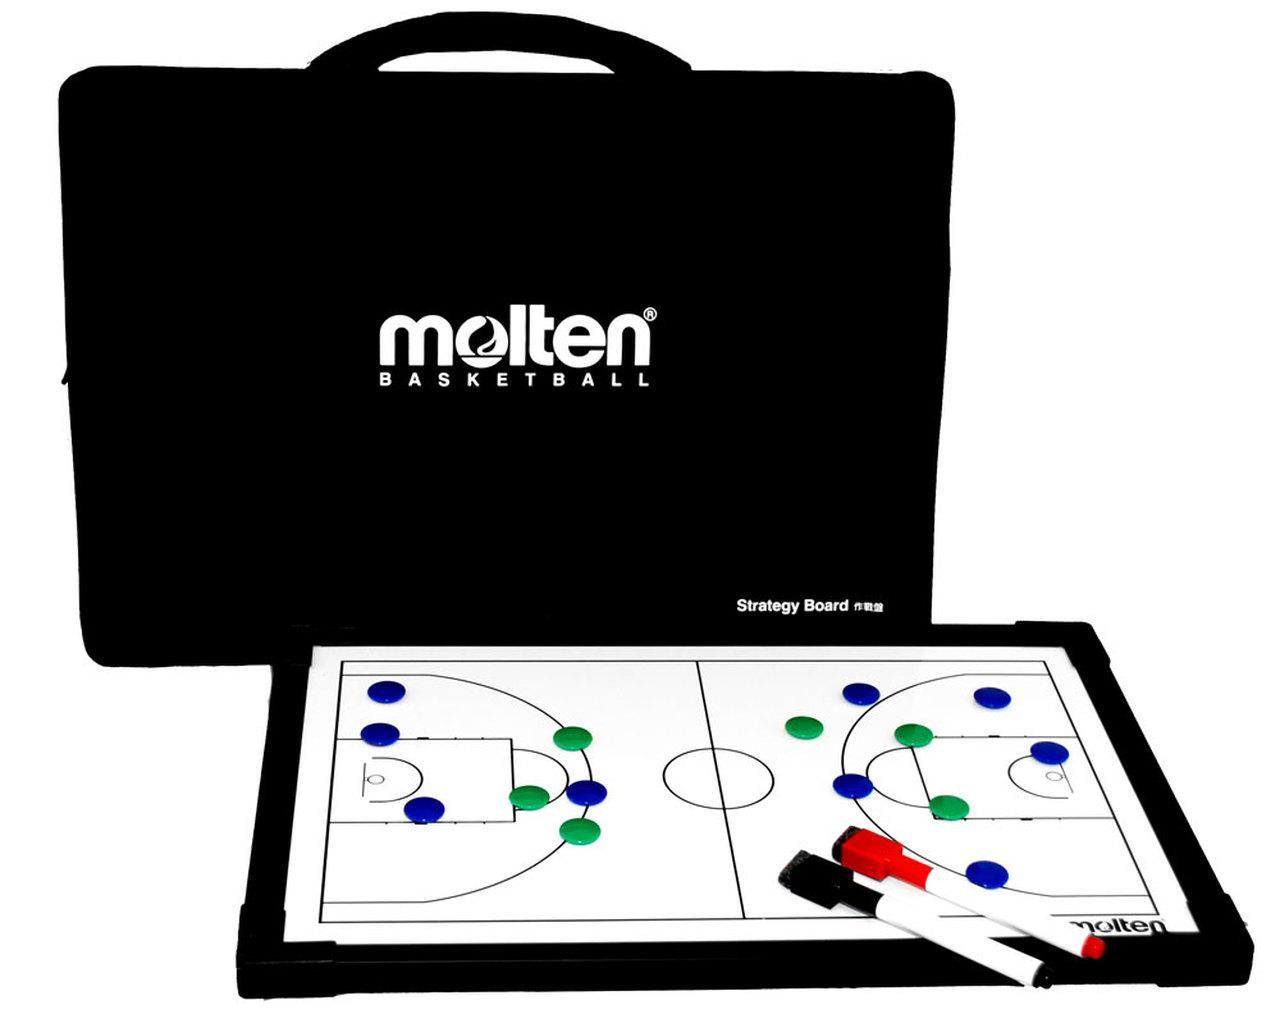 Bảng chiến thuật bóng rổ Molten